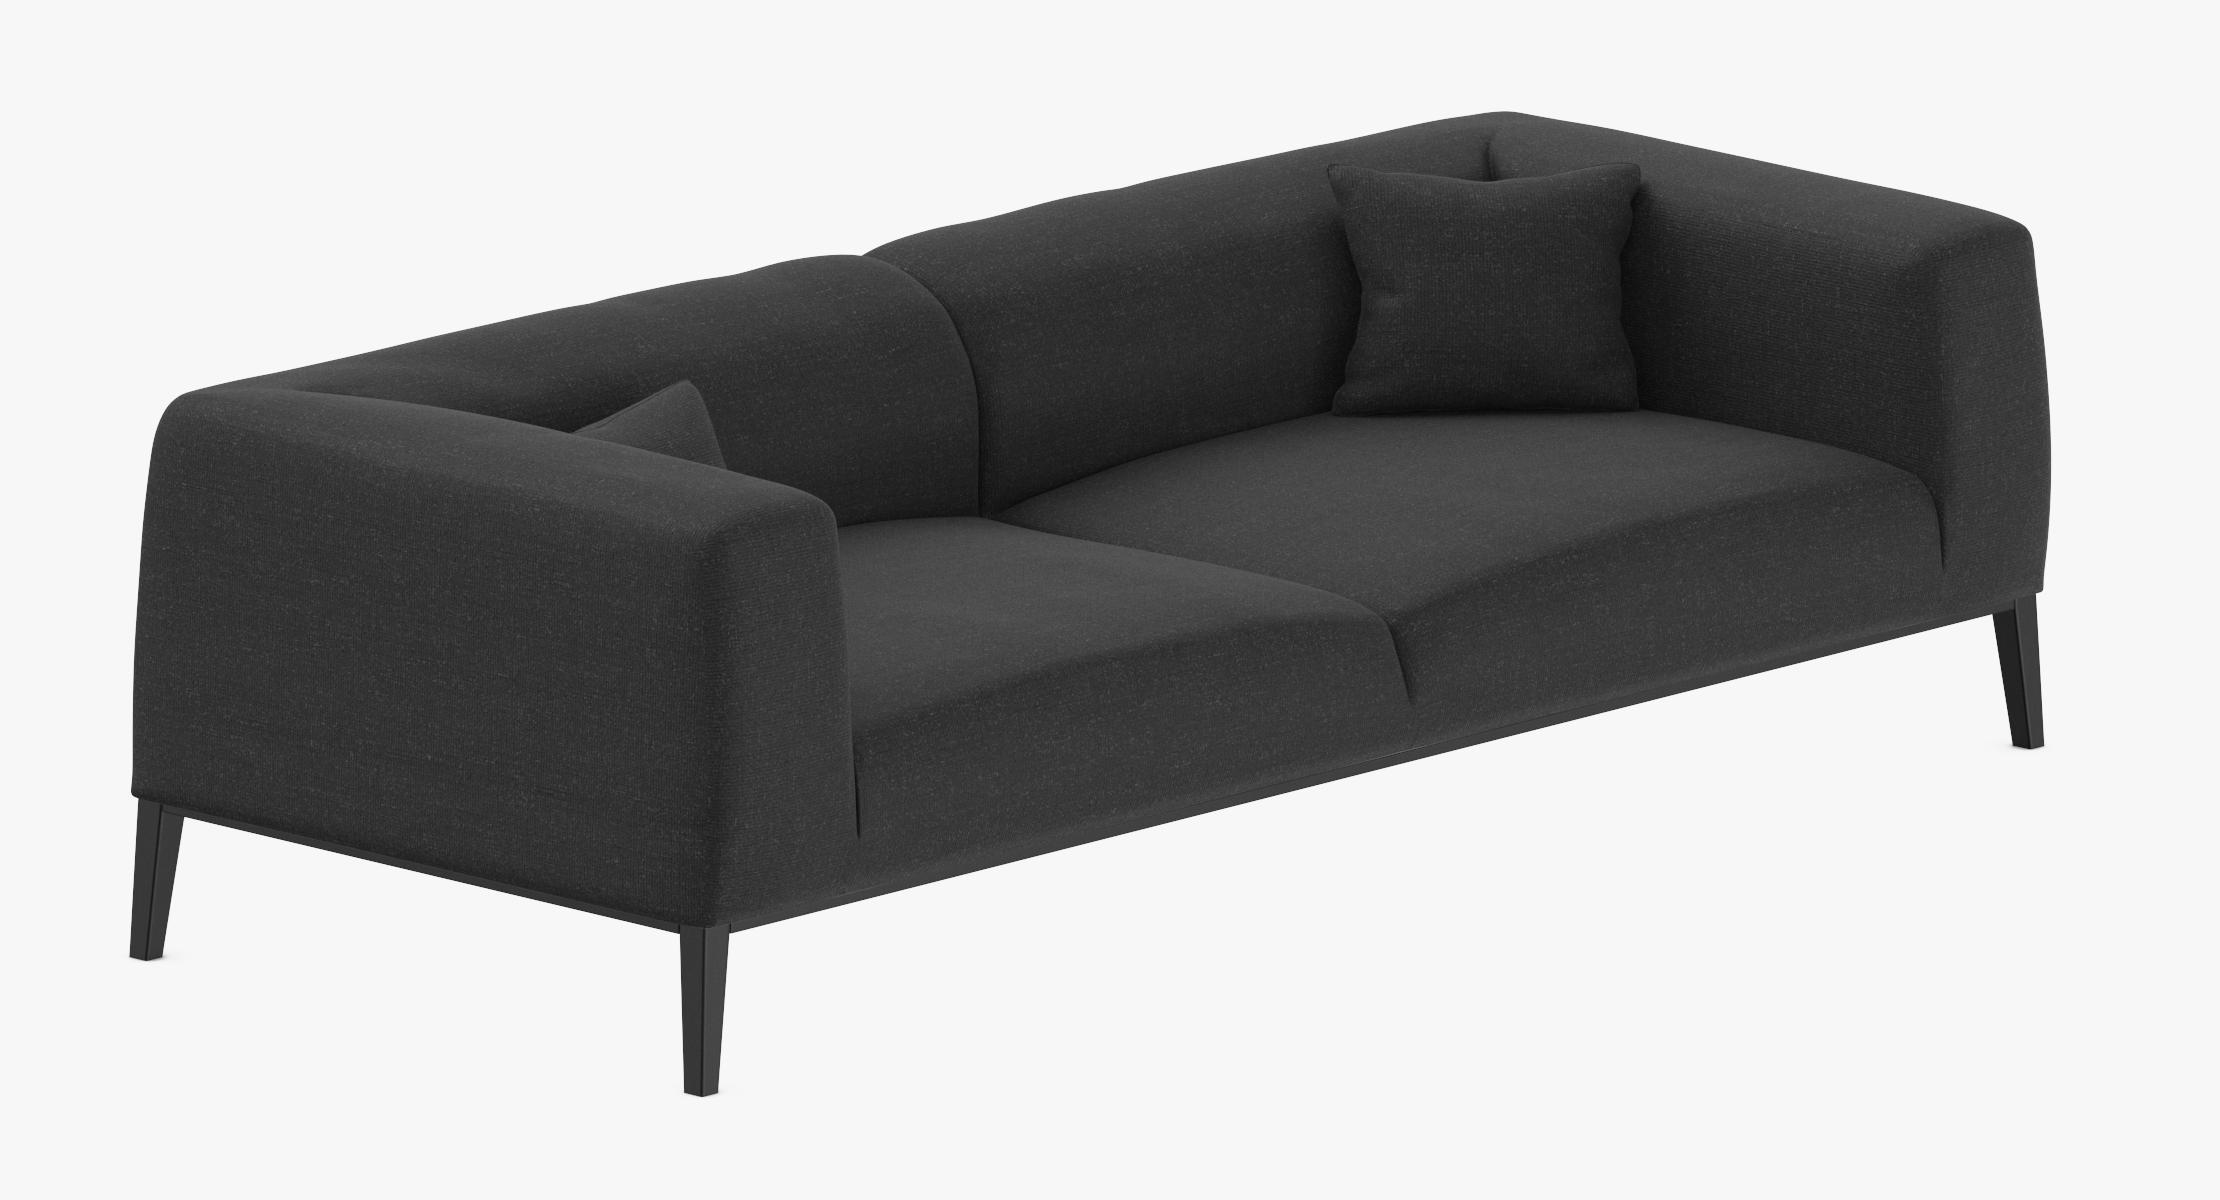 Modern 4-seater Sofa - reel 1